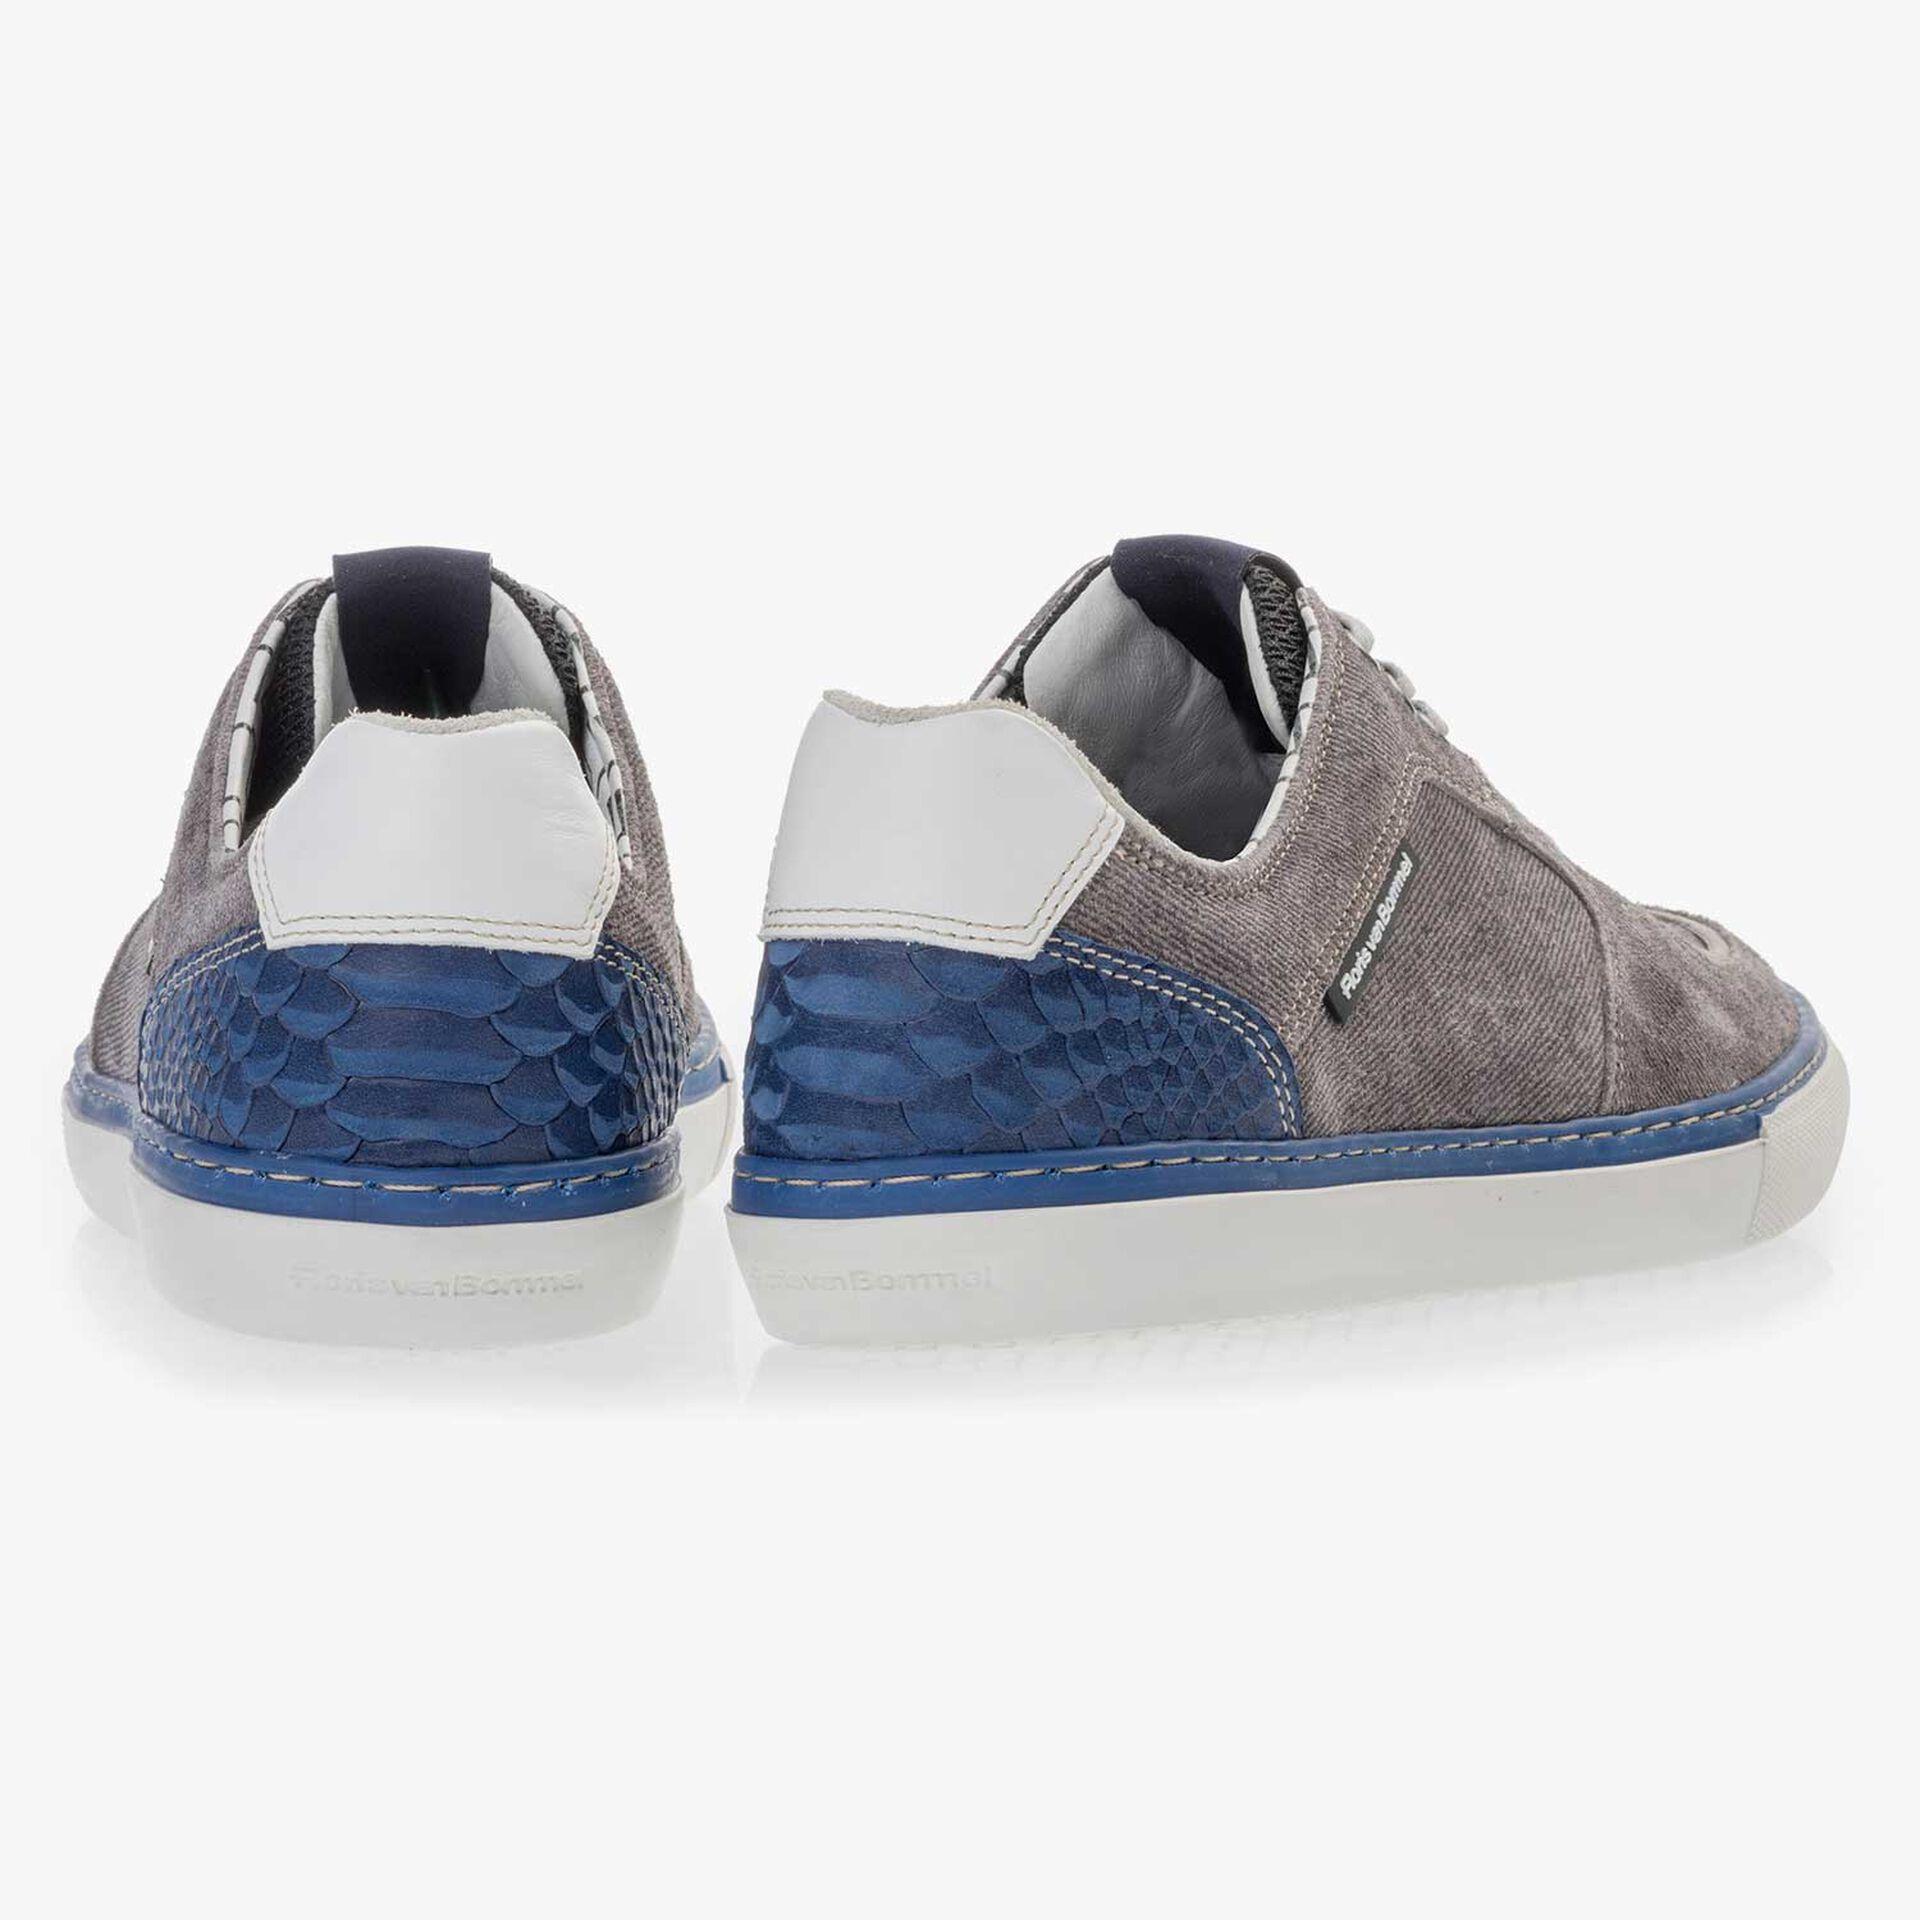 Grauer bedruckter Wildleder Sneaker